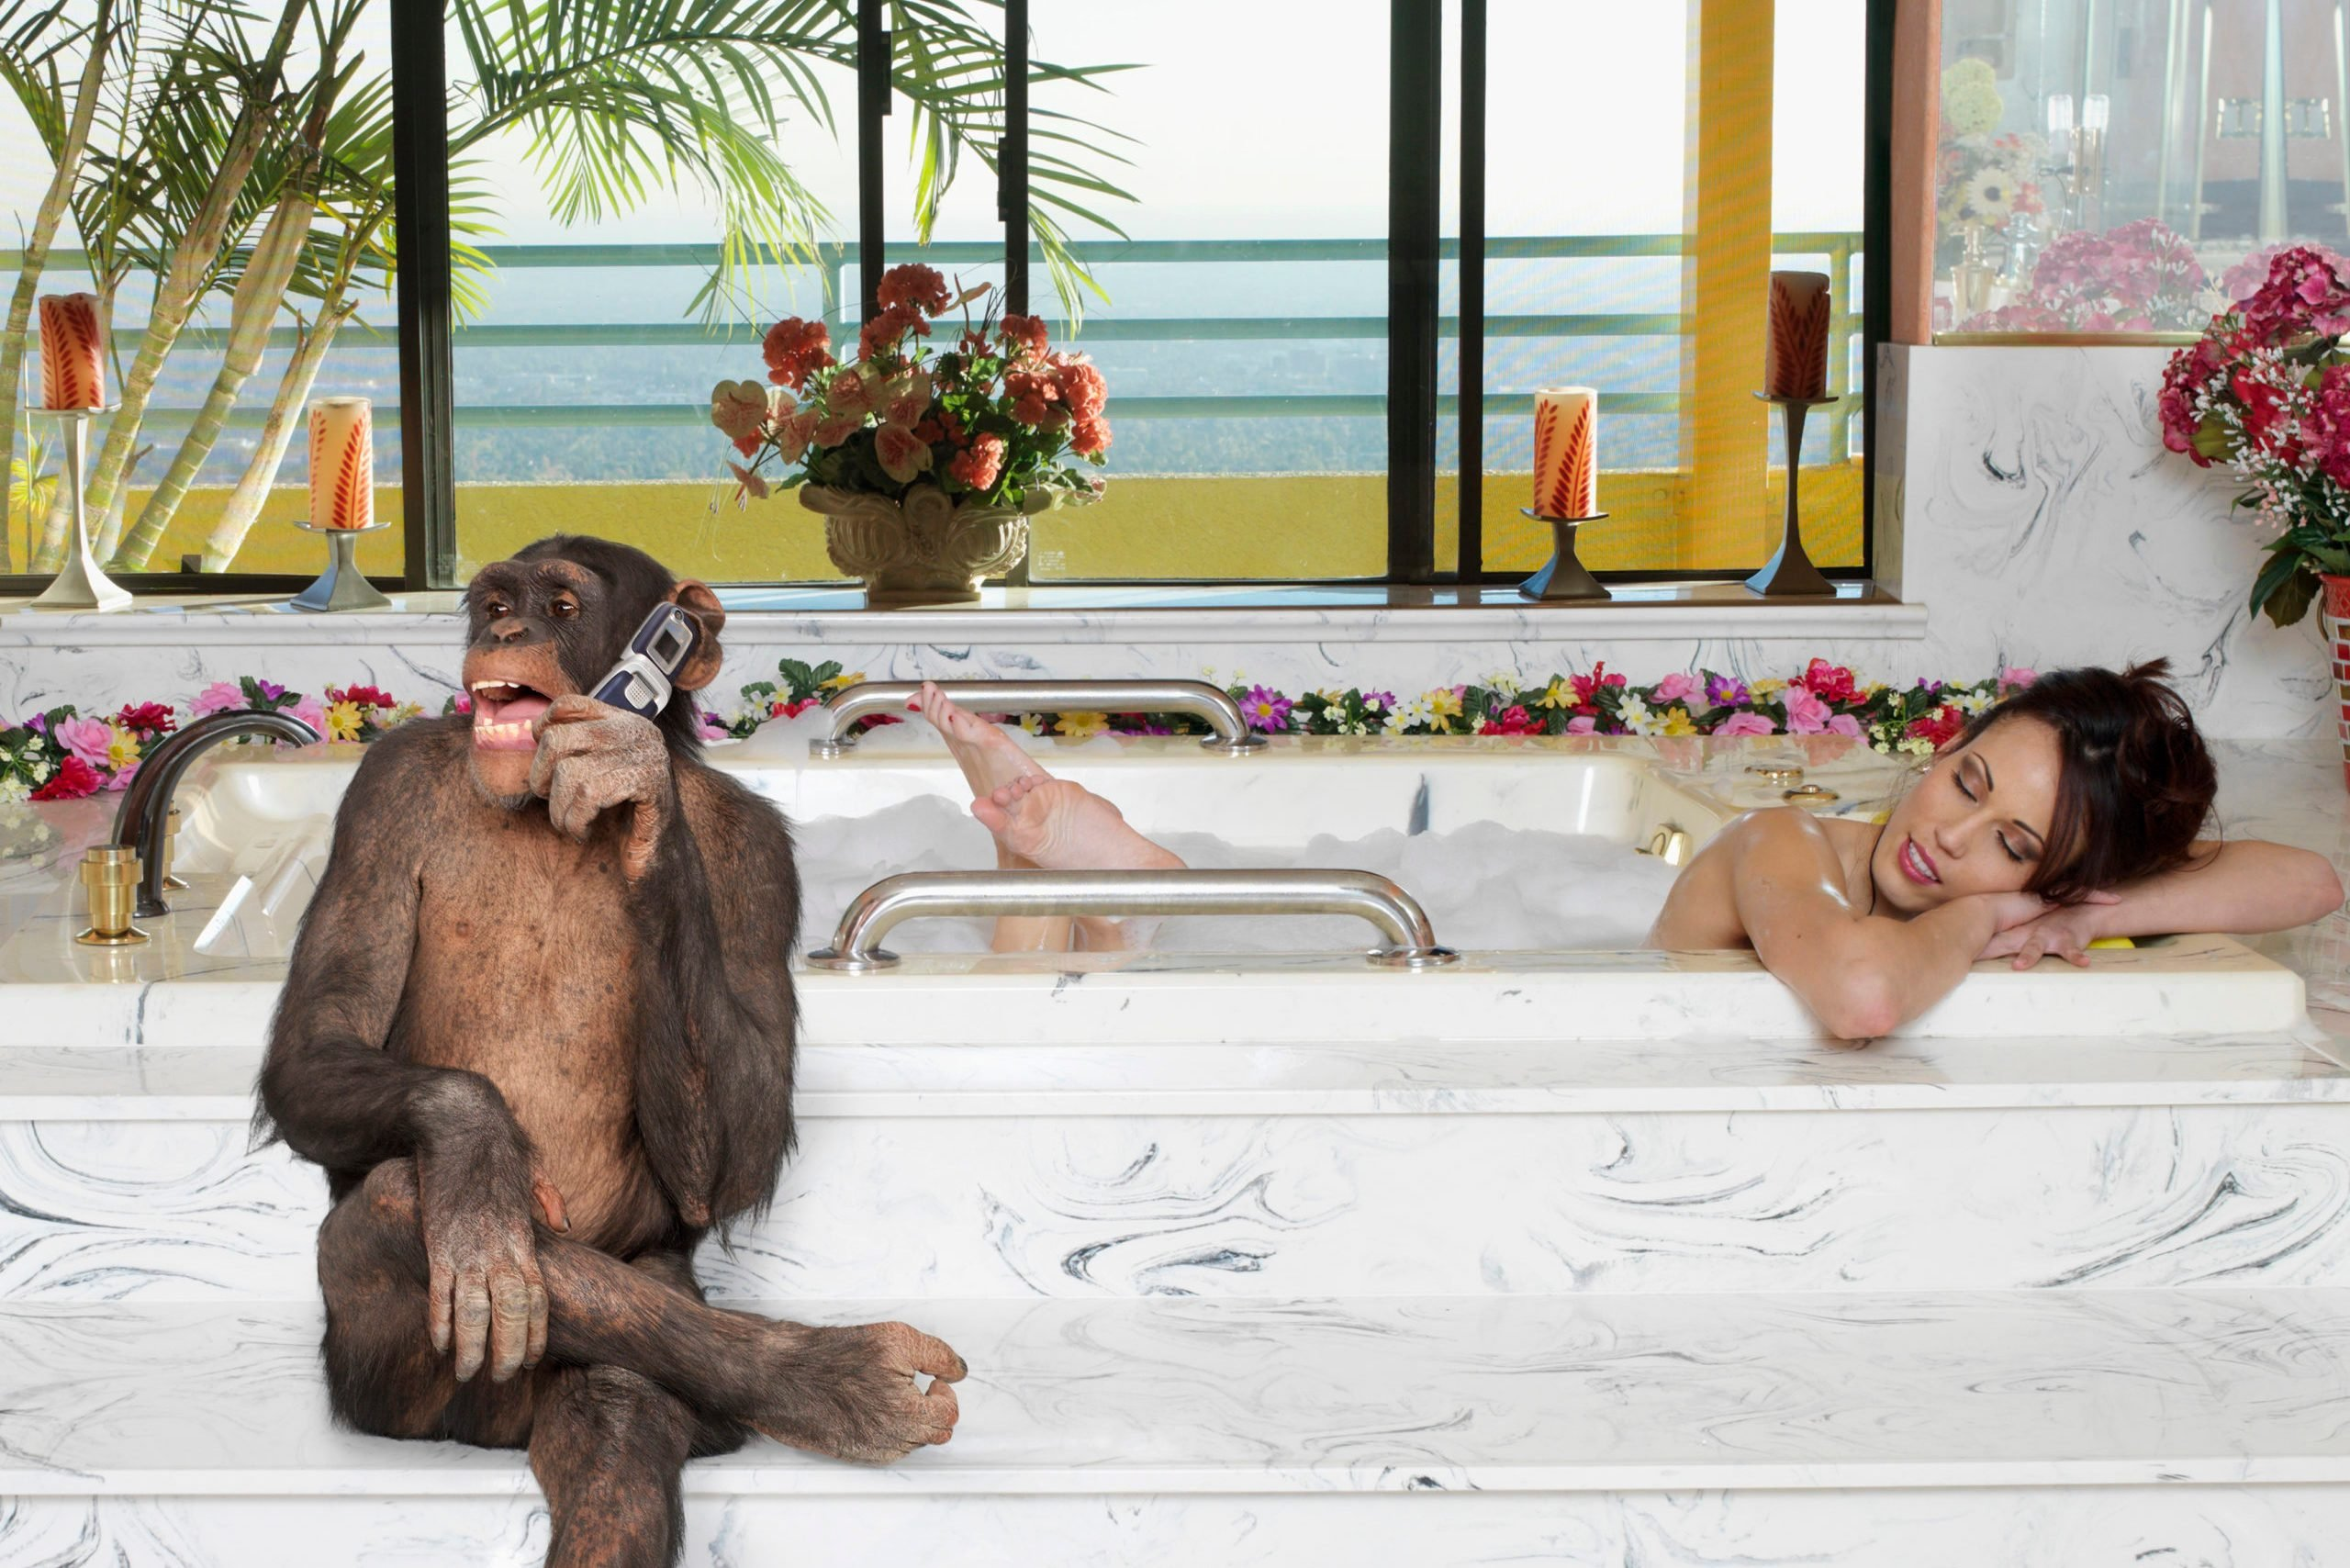 Monkey talking on cell phone while woman takes a bath